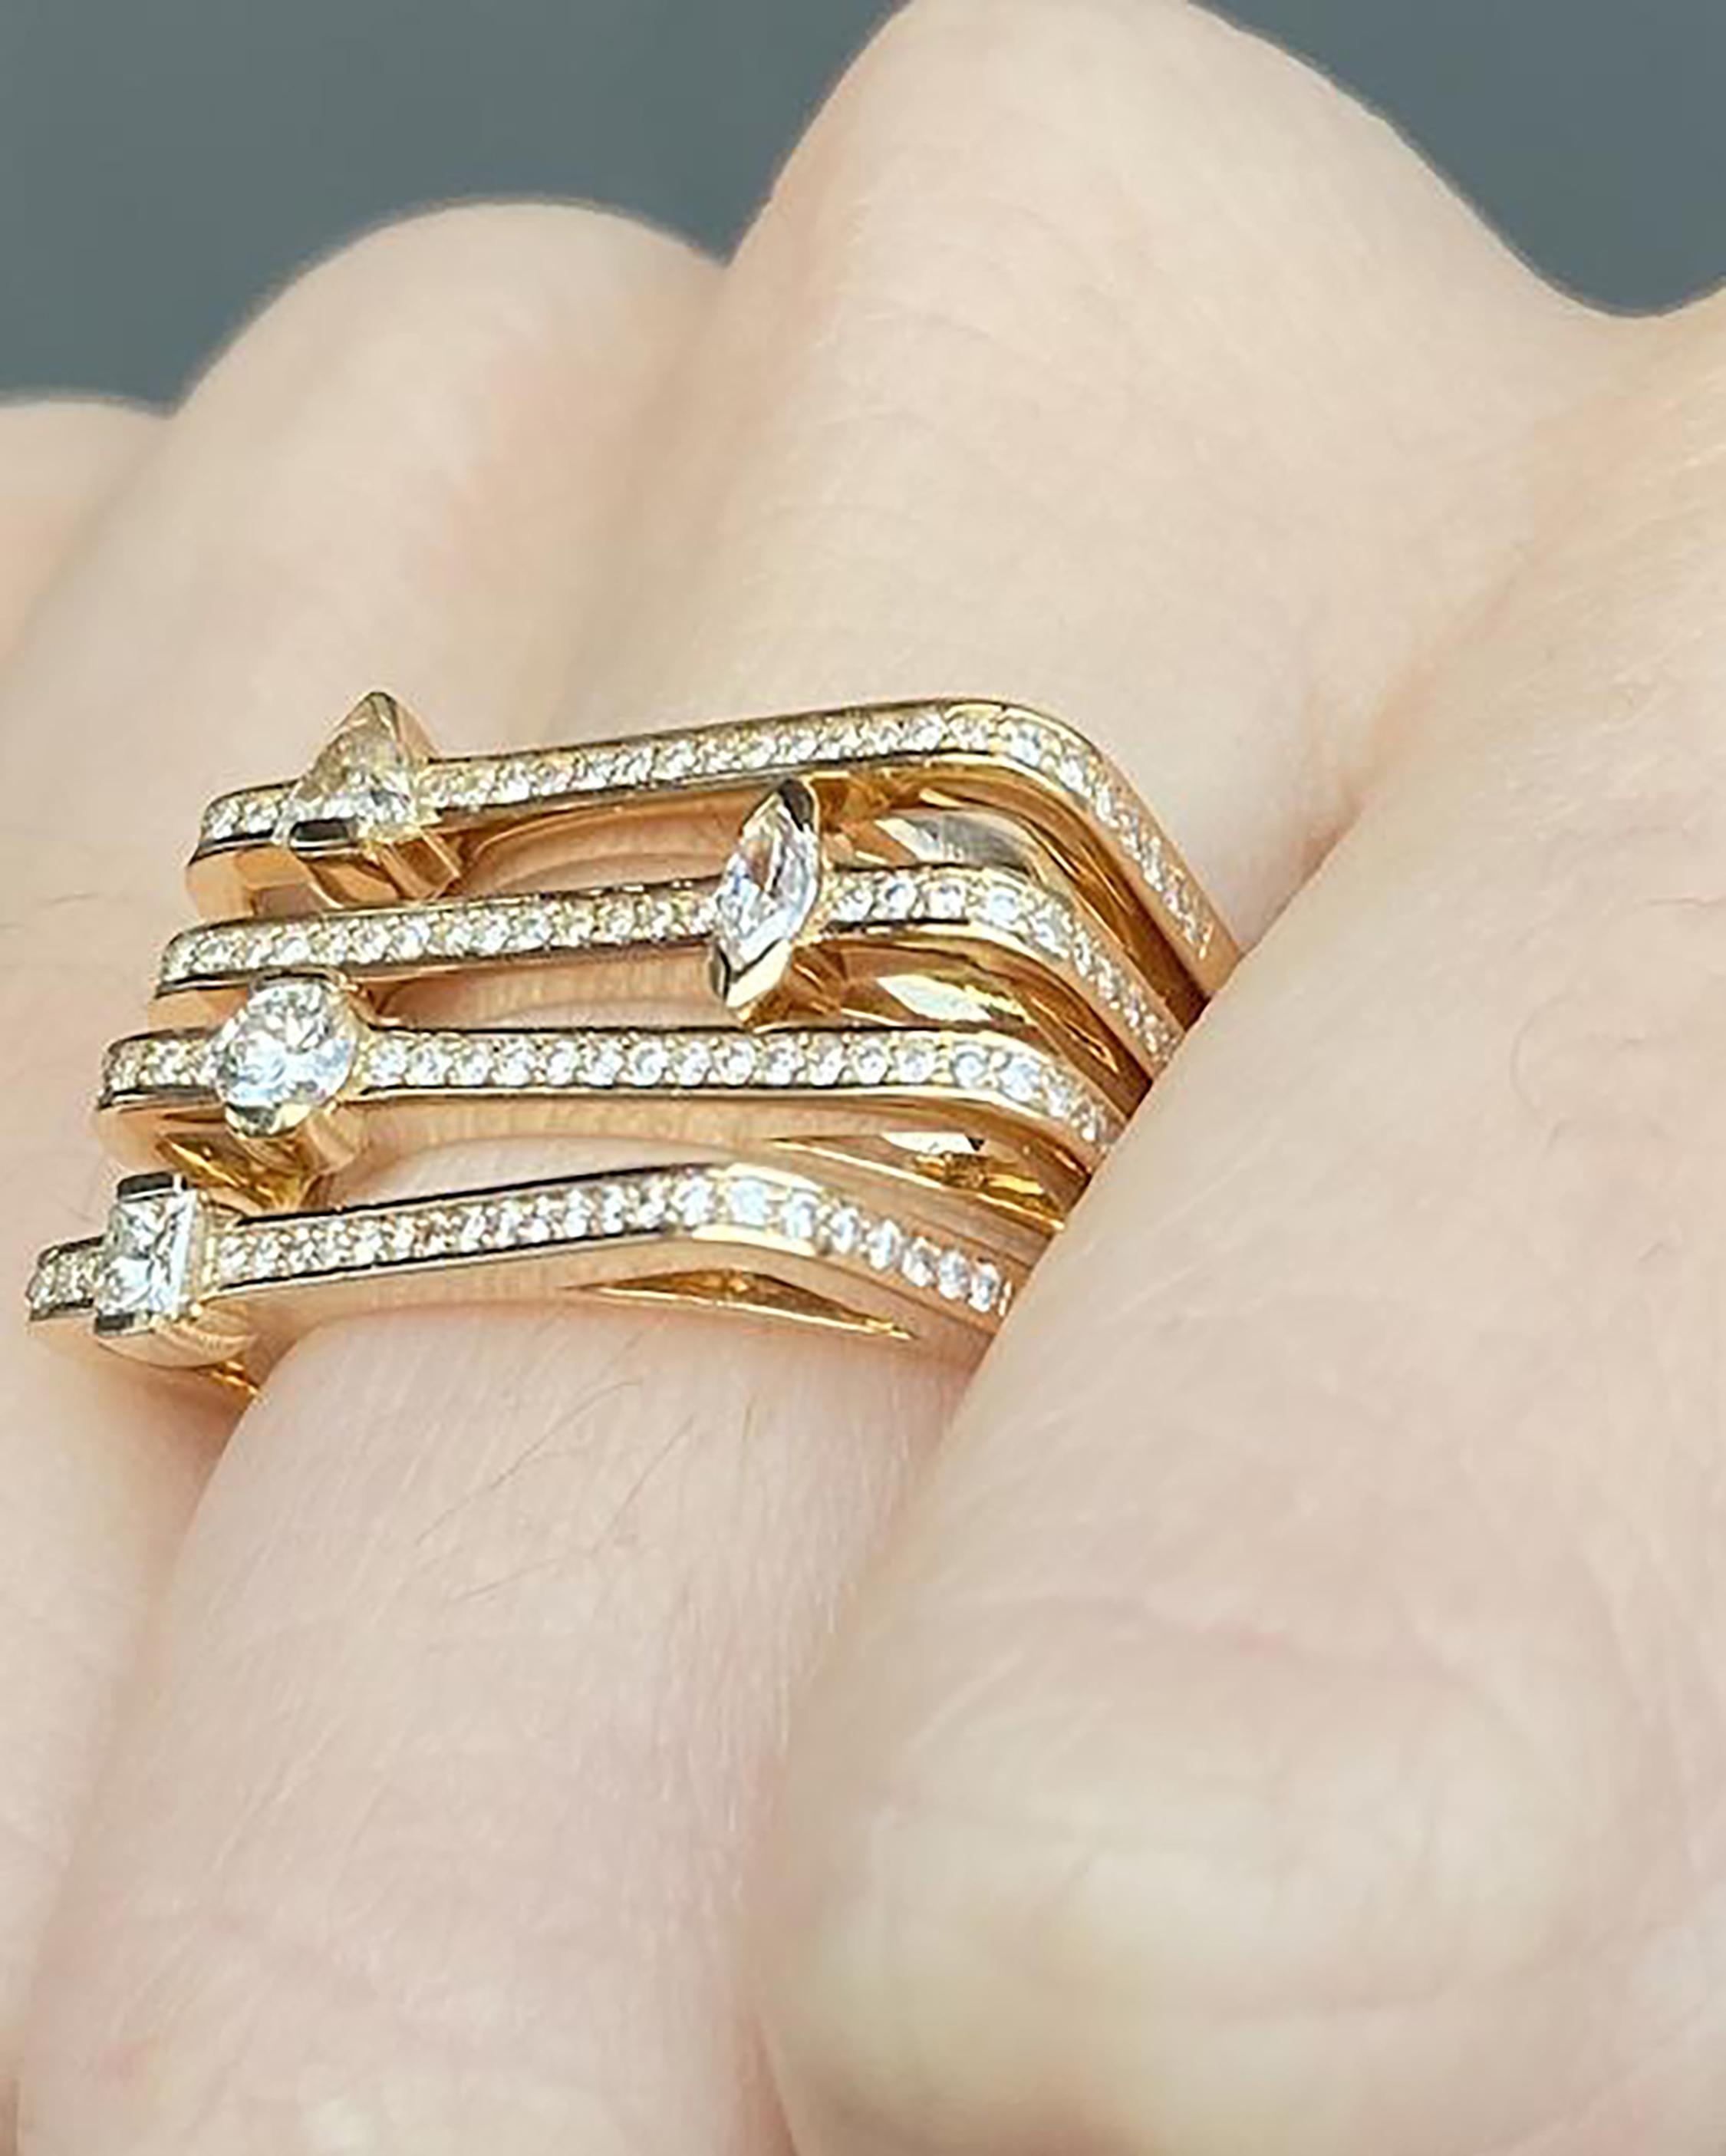 Colette Jewelry Trilliant-Cut Diamond Bar Ring 1